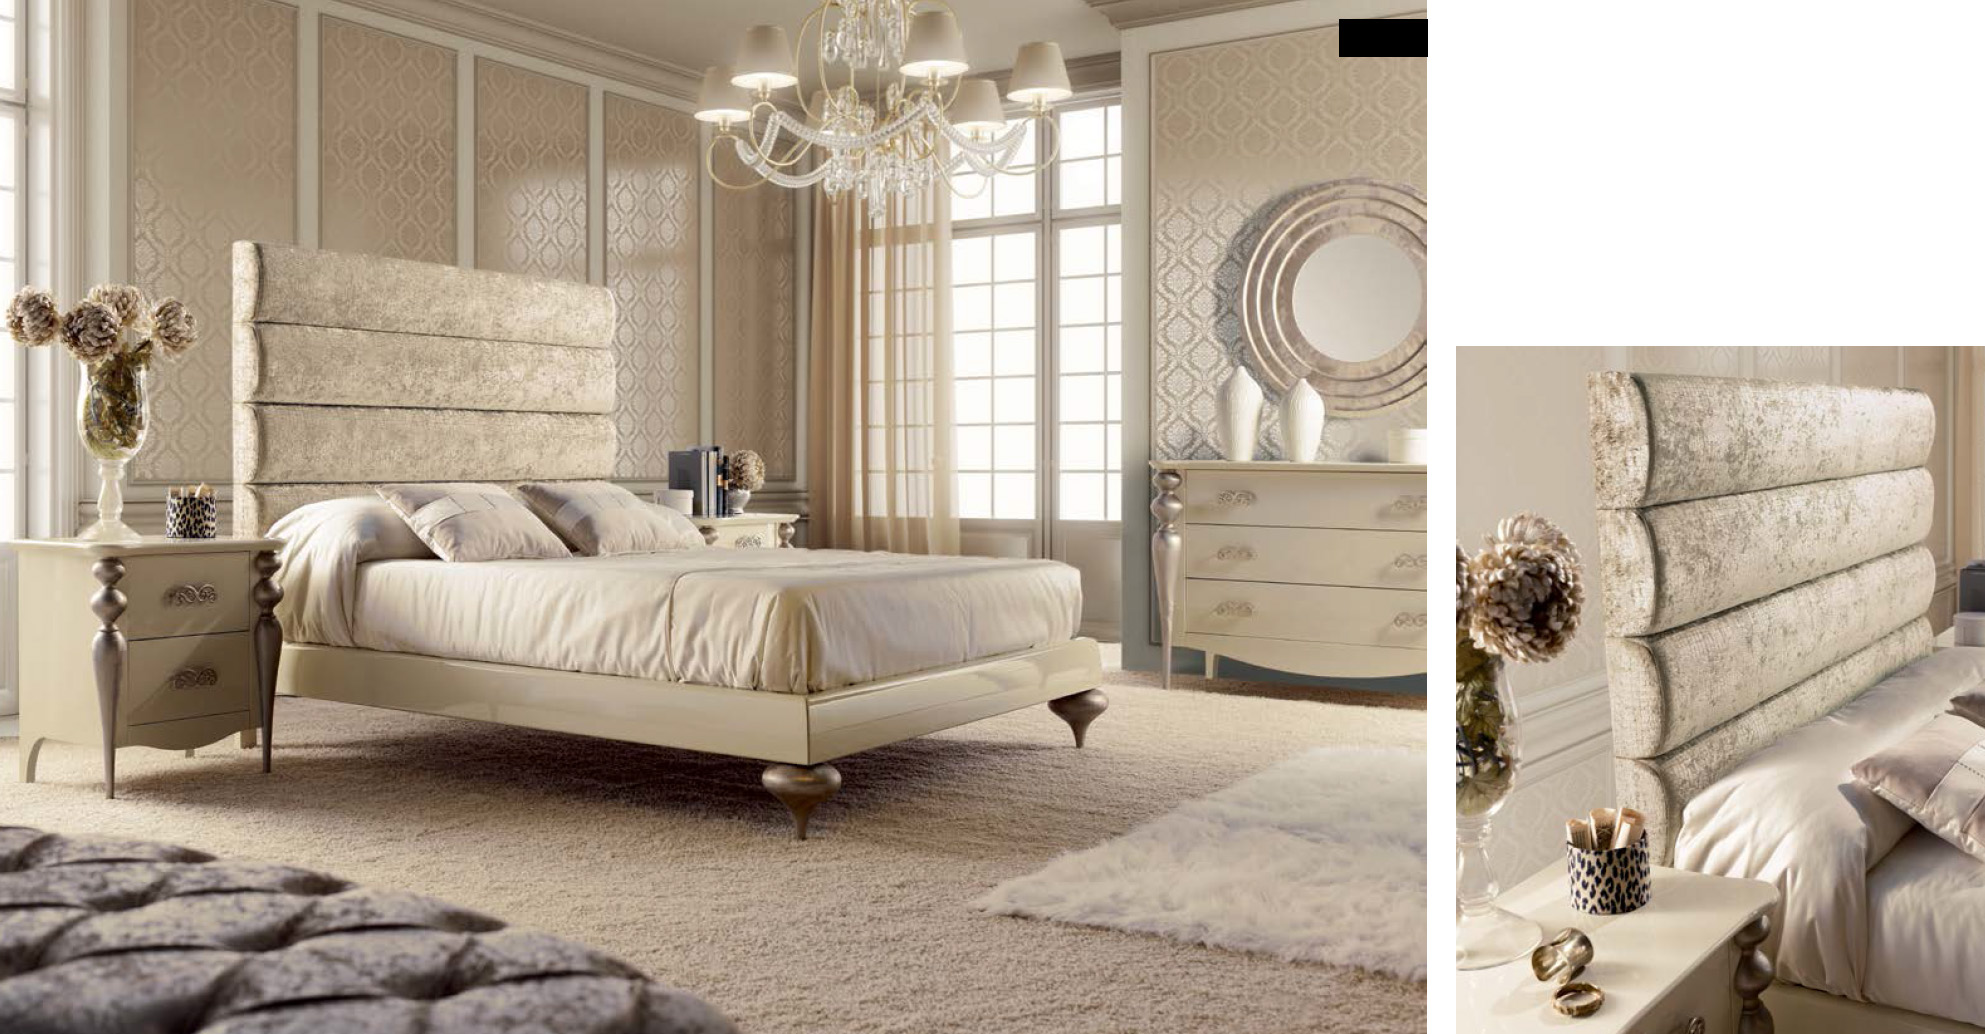 dormitorios de matrimonio de estilo clasico (40)